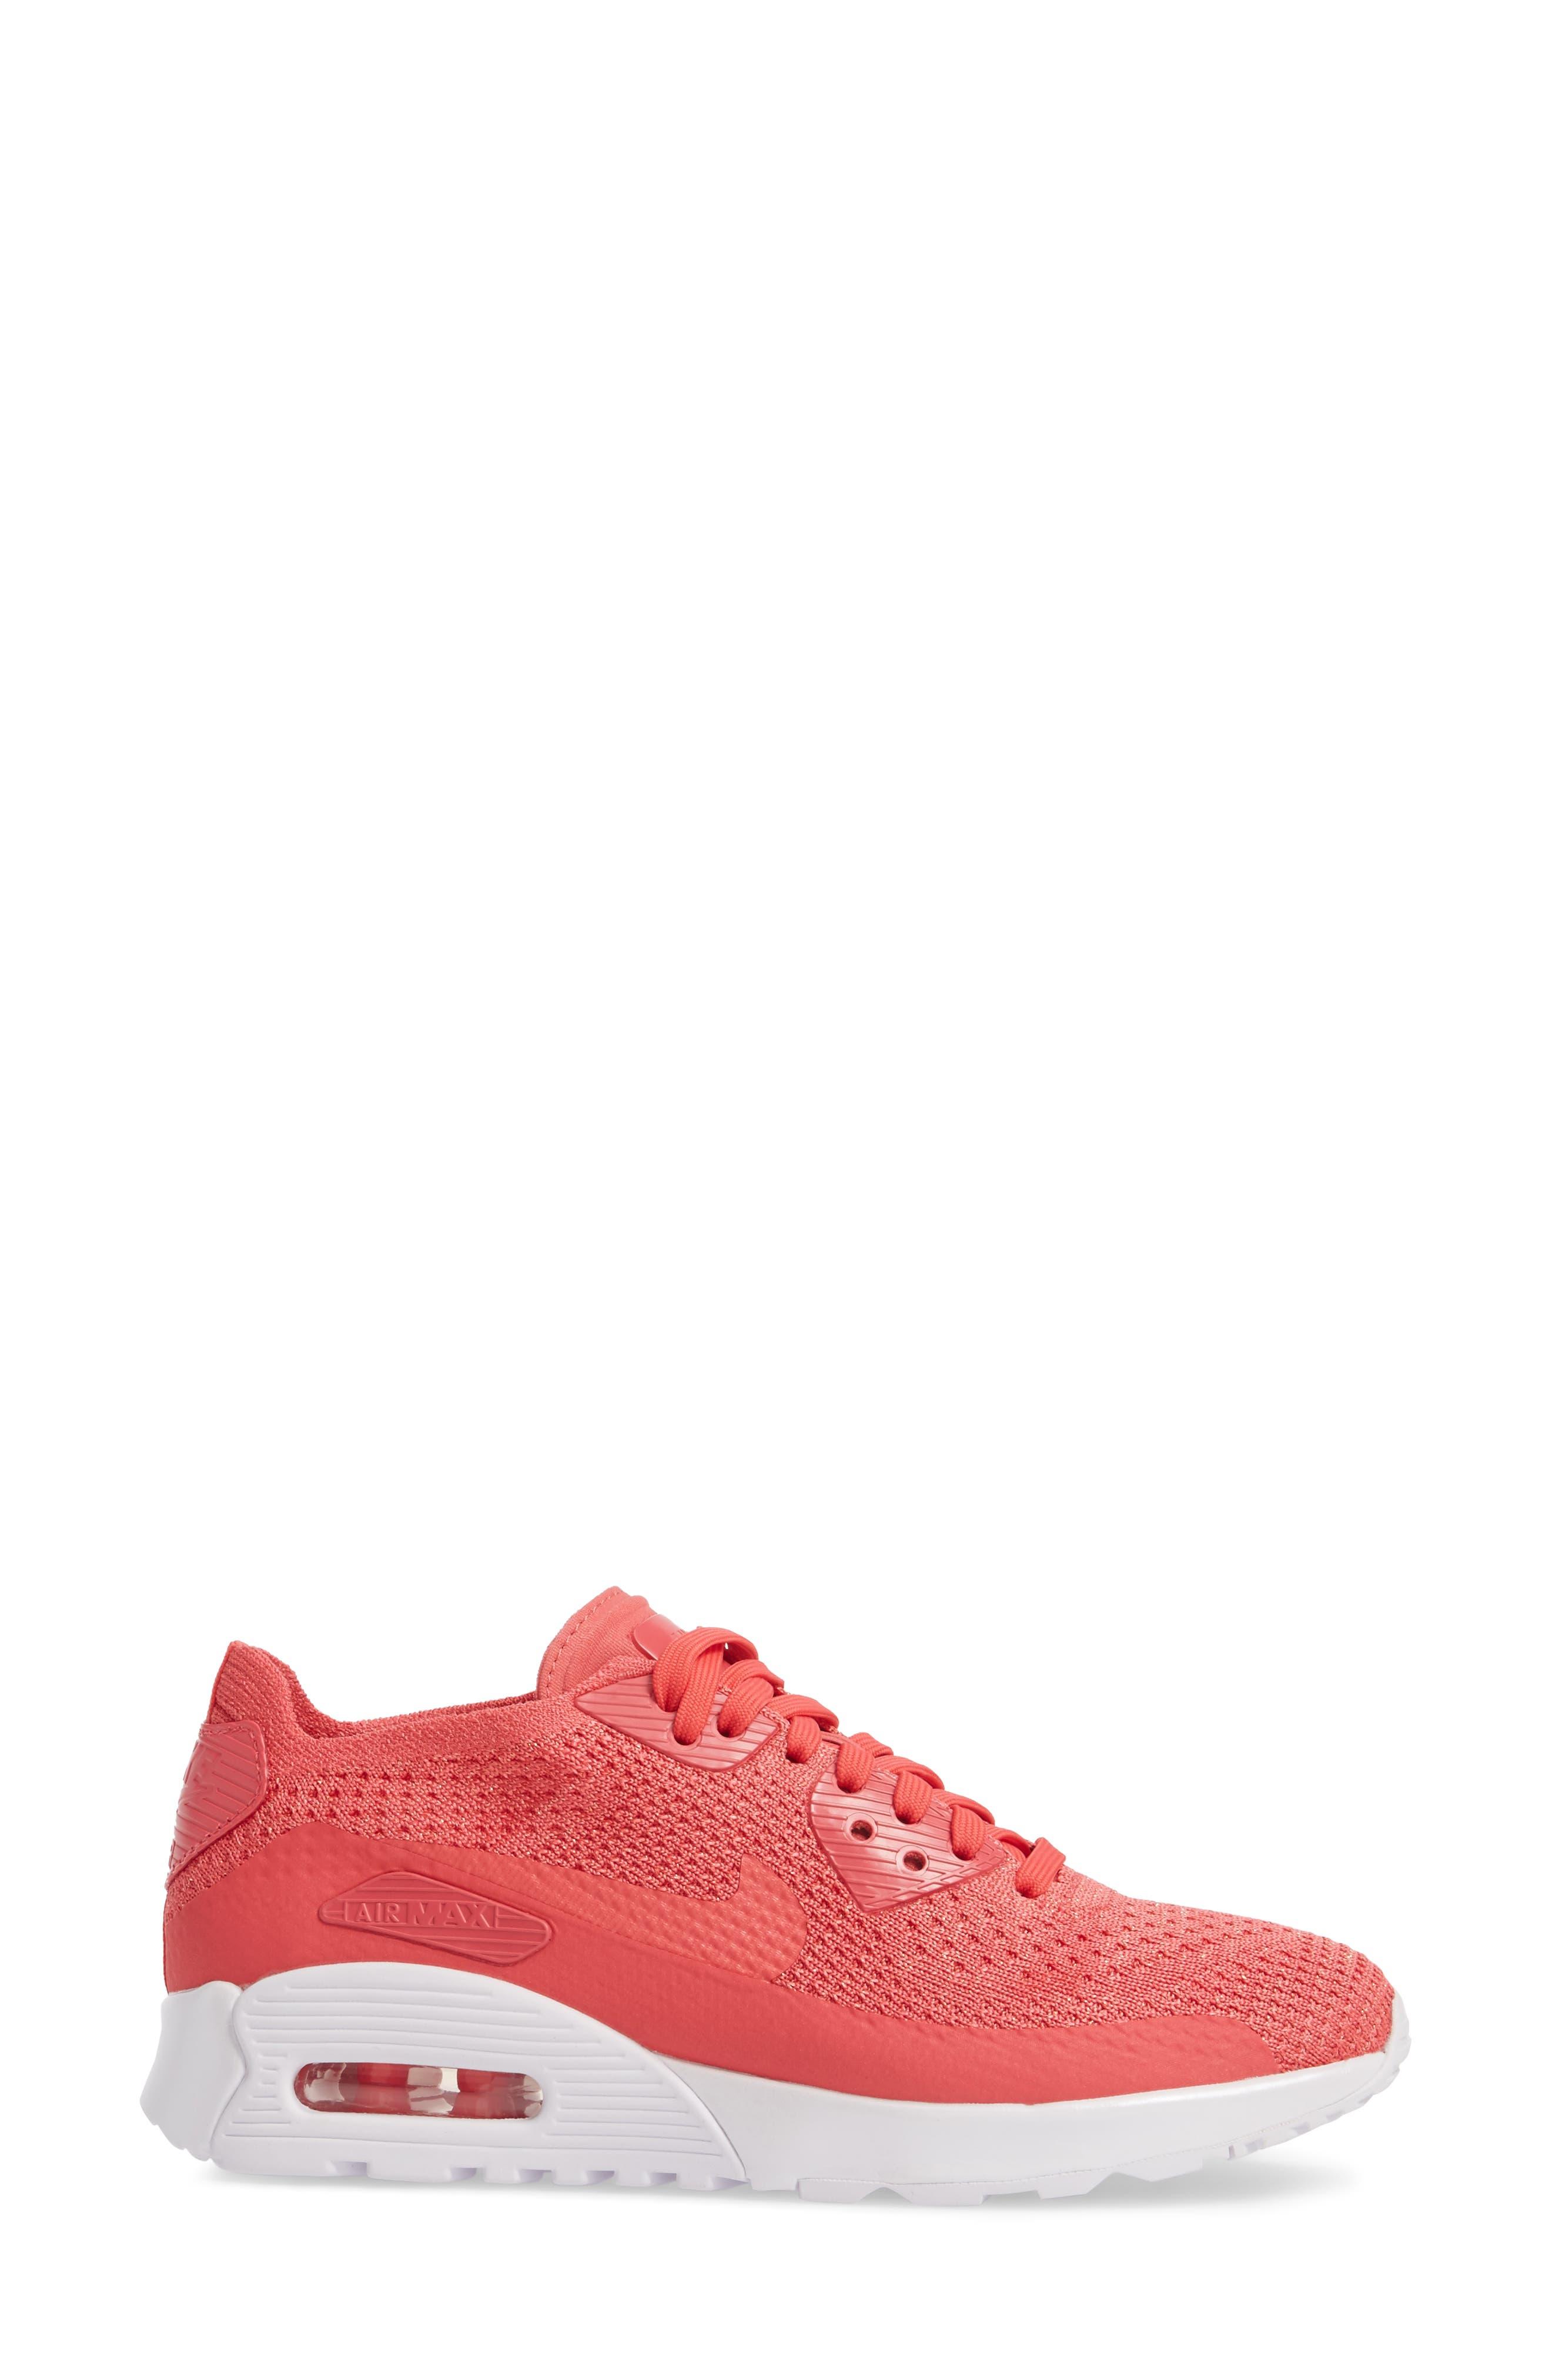 Air Max 90 Flyknit Ultra 2.0 Sneaker,                             Alternate thumbnail 3, color,                             Geranium/ Geranium